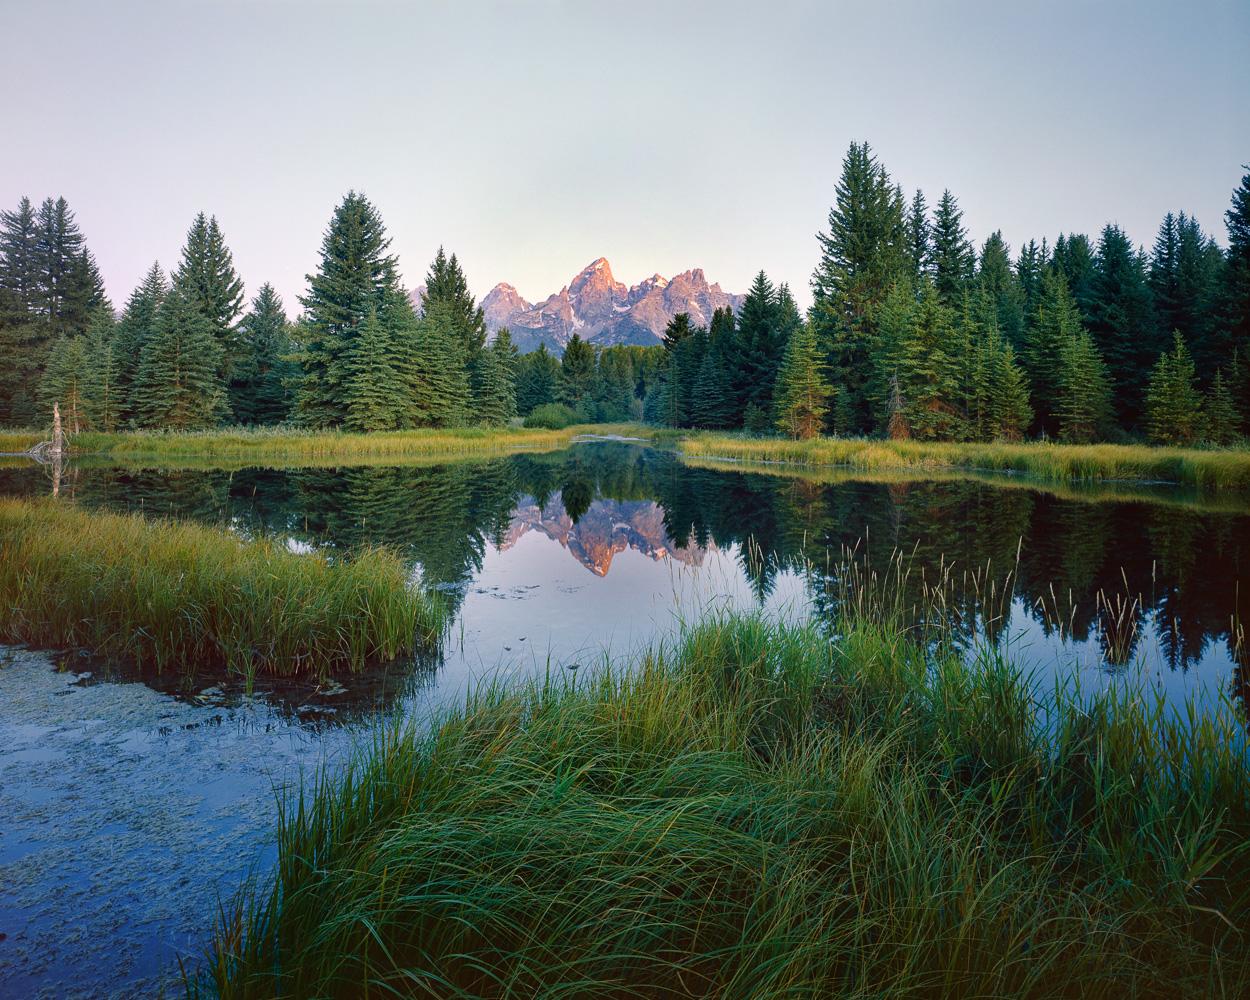 Dawn on the Grand Teton. Ektar 100, 4x5.